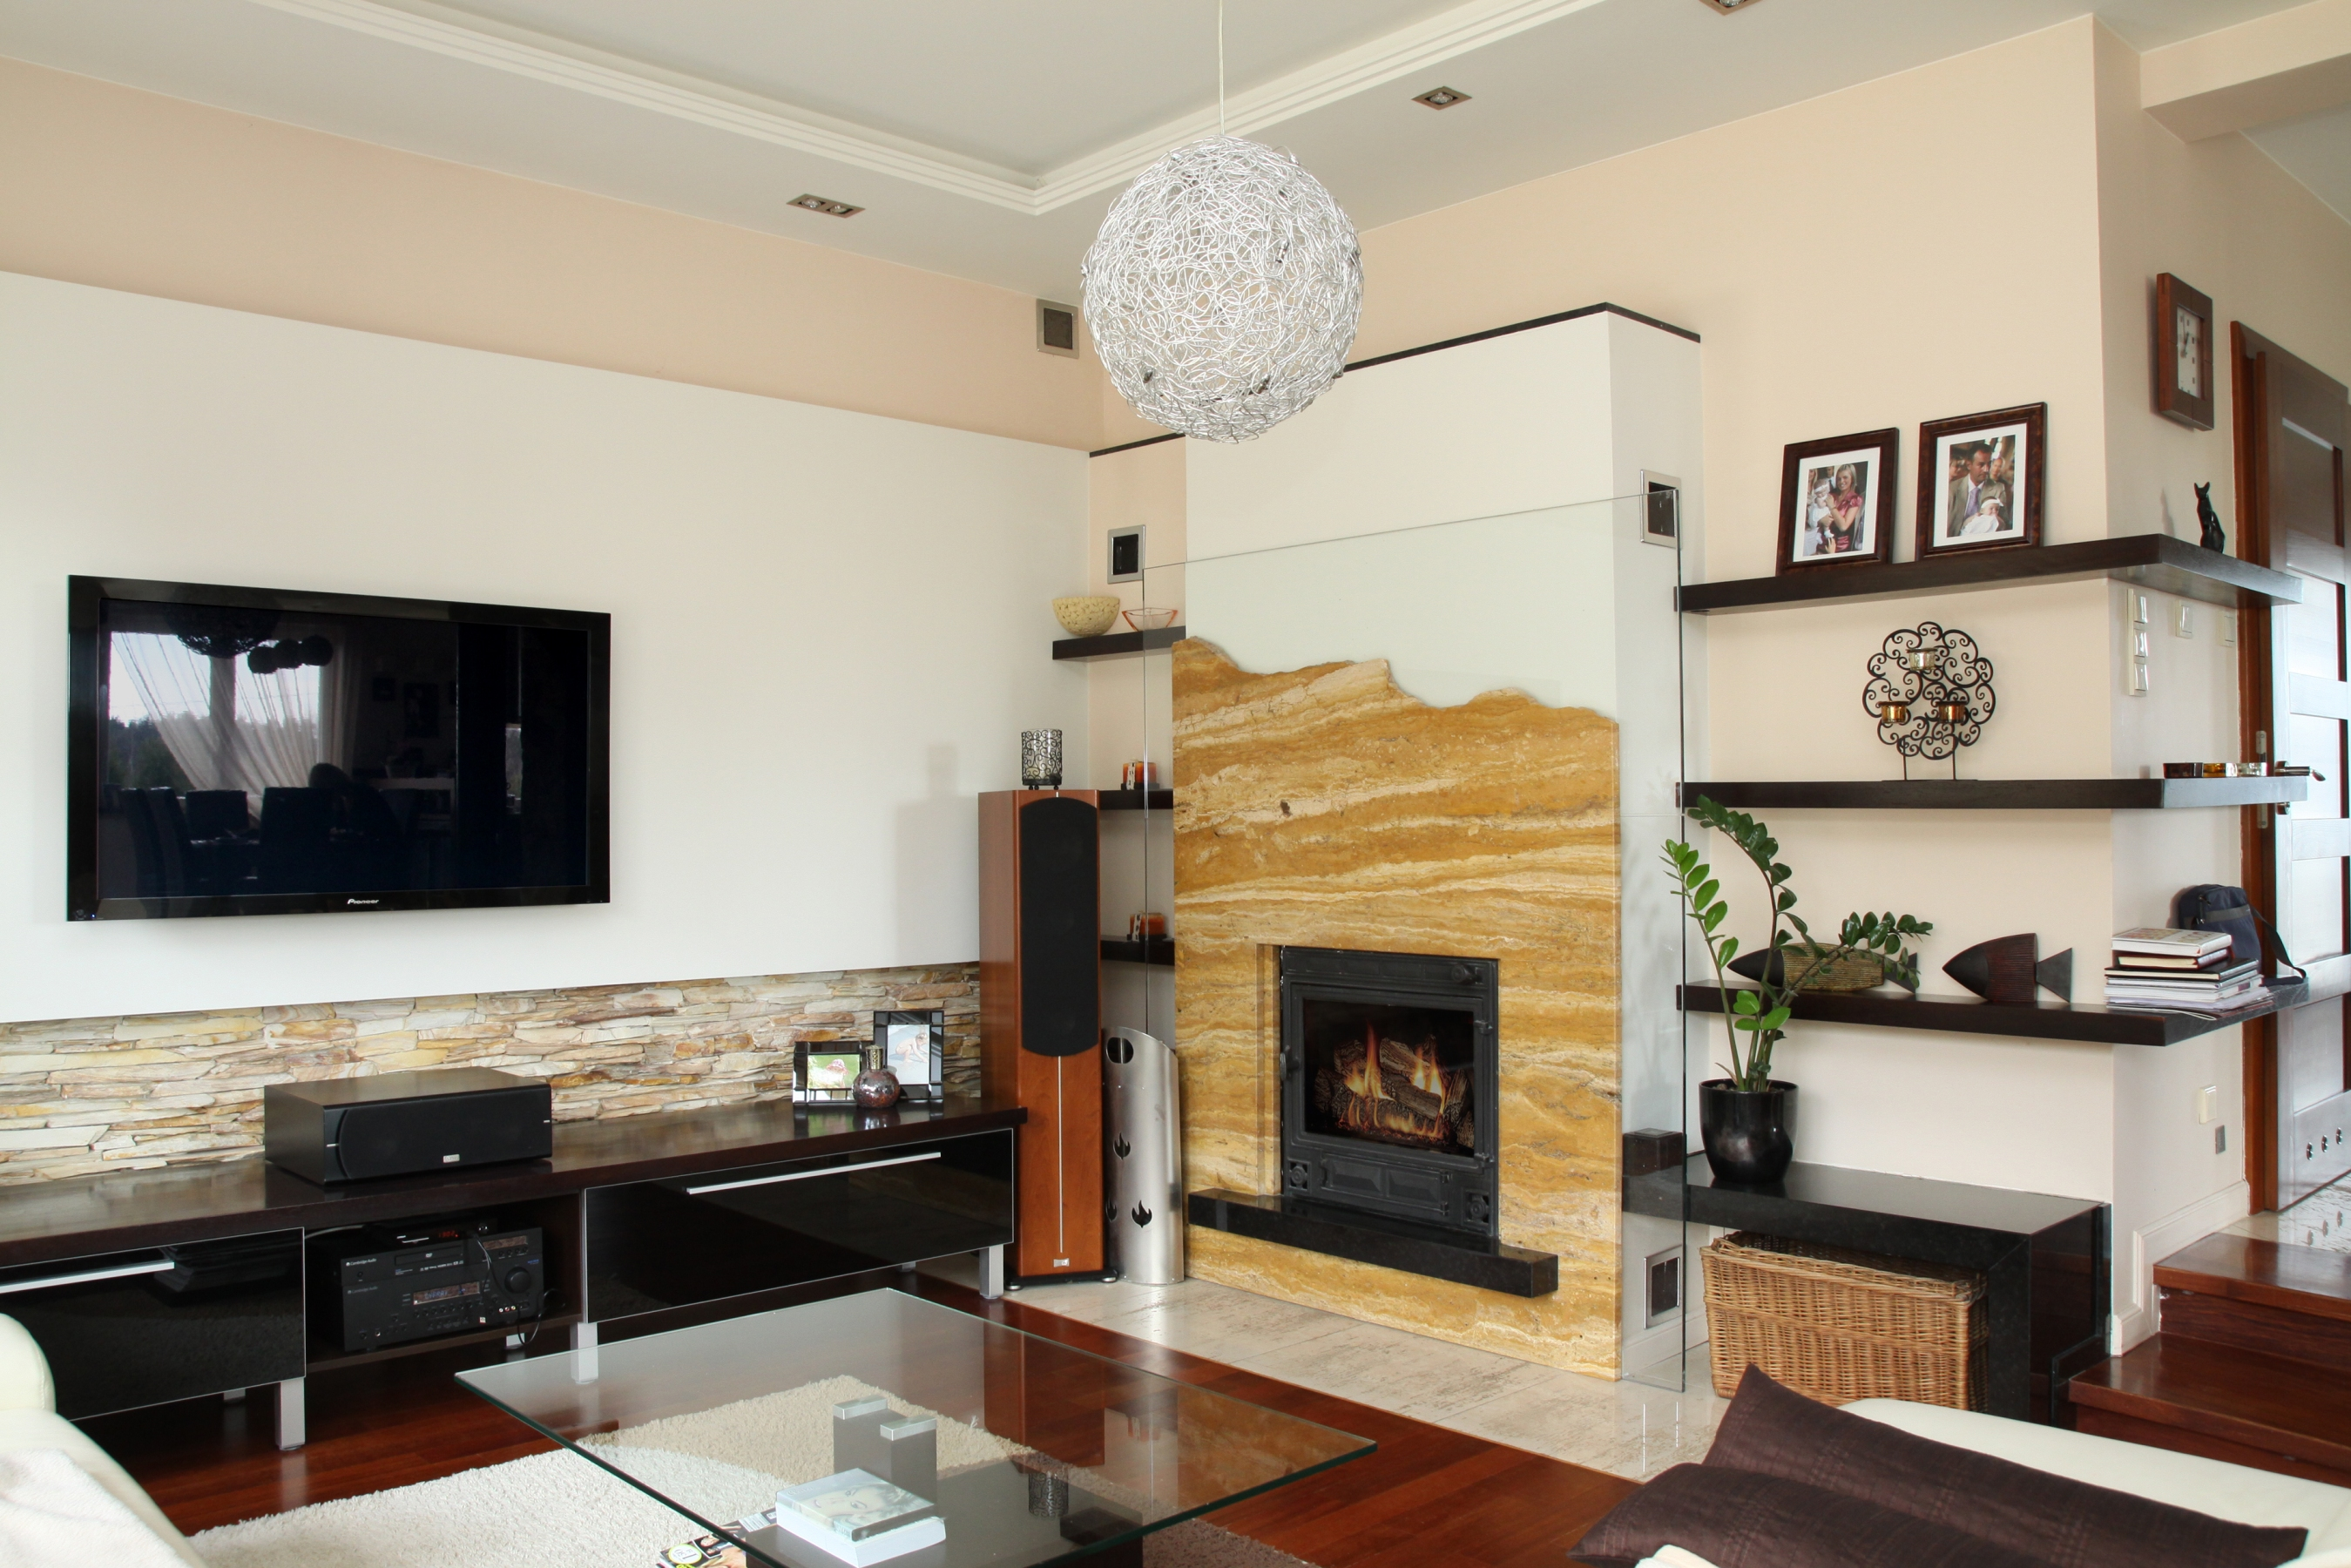 moderner kamin wasserf hrend wa04 mit montage. Black Bedroom Furniture Sets. Home Design Ideas